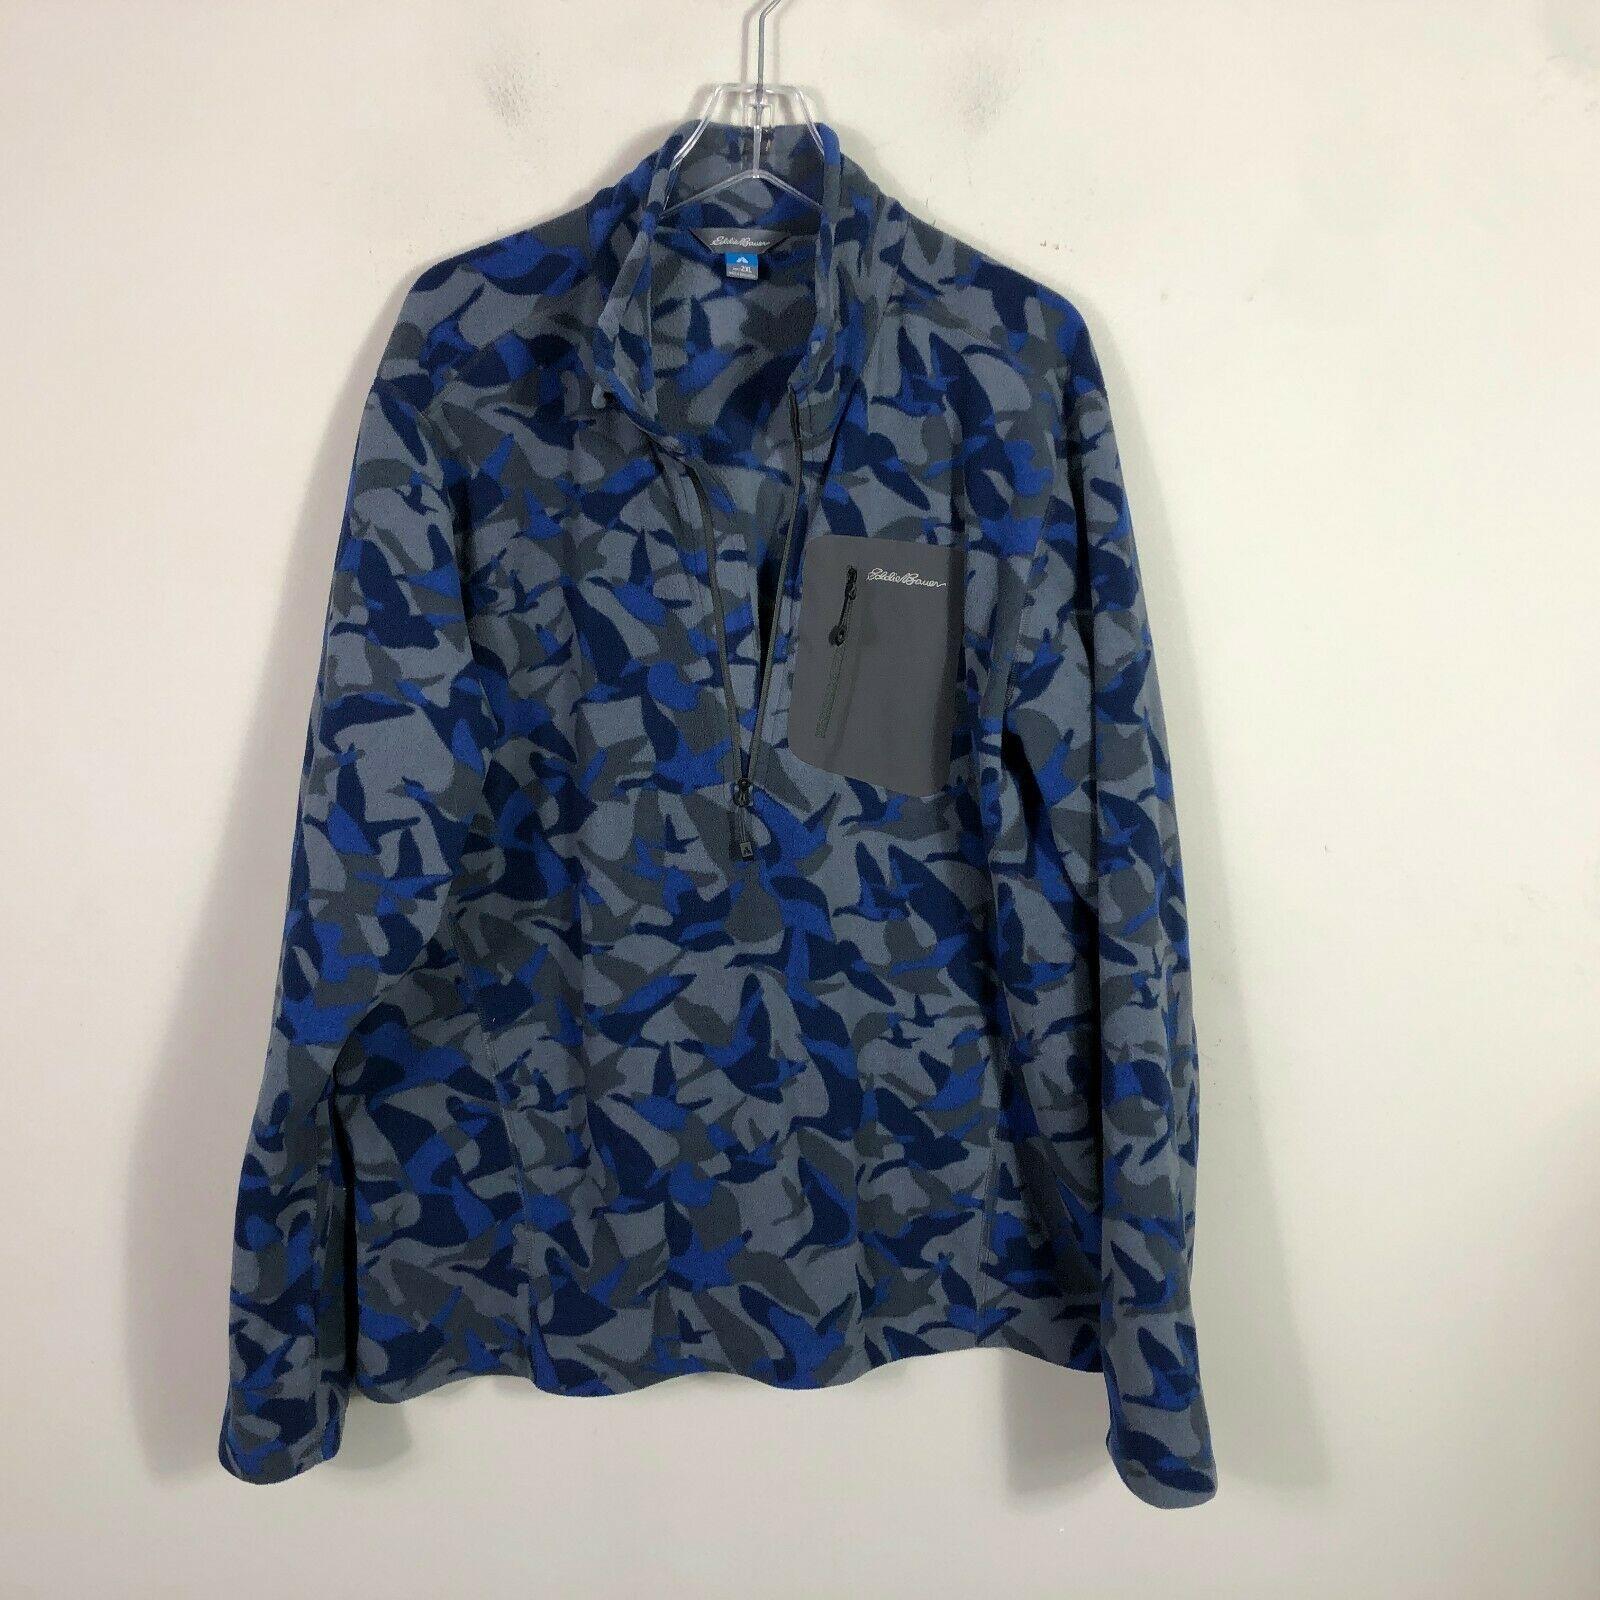 Eddie Bauer First Ascent Fleece Jacket 1/2 Zip Men's 2XL Blue Gray Long Sleeve image 6